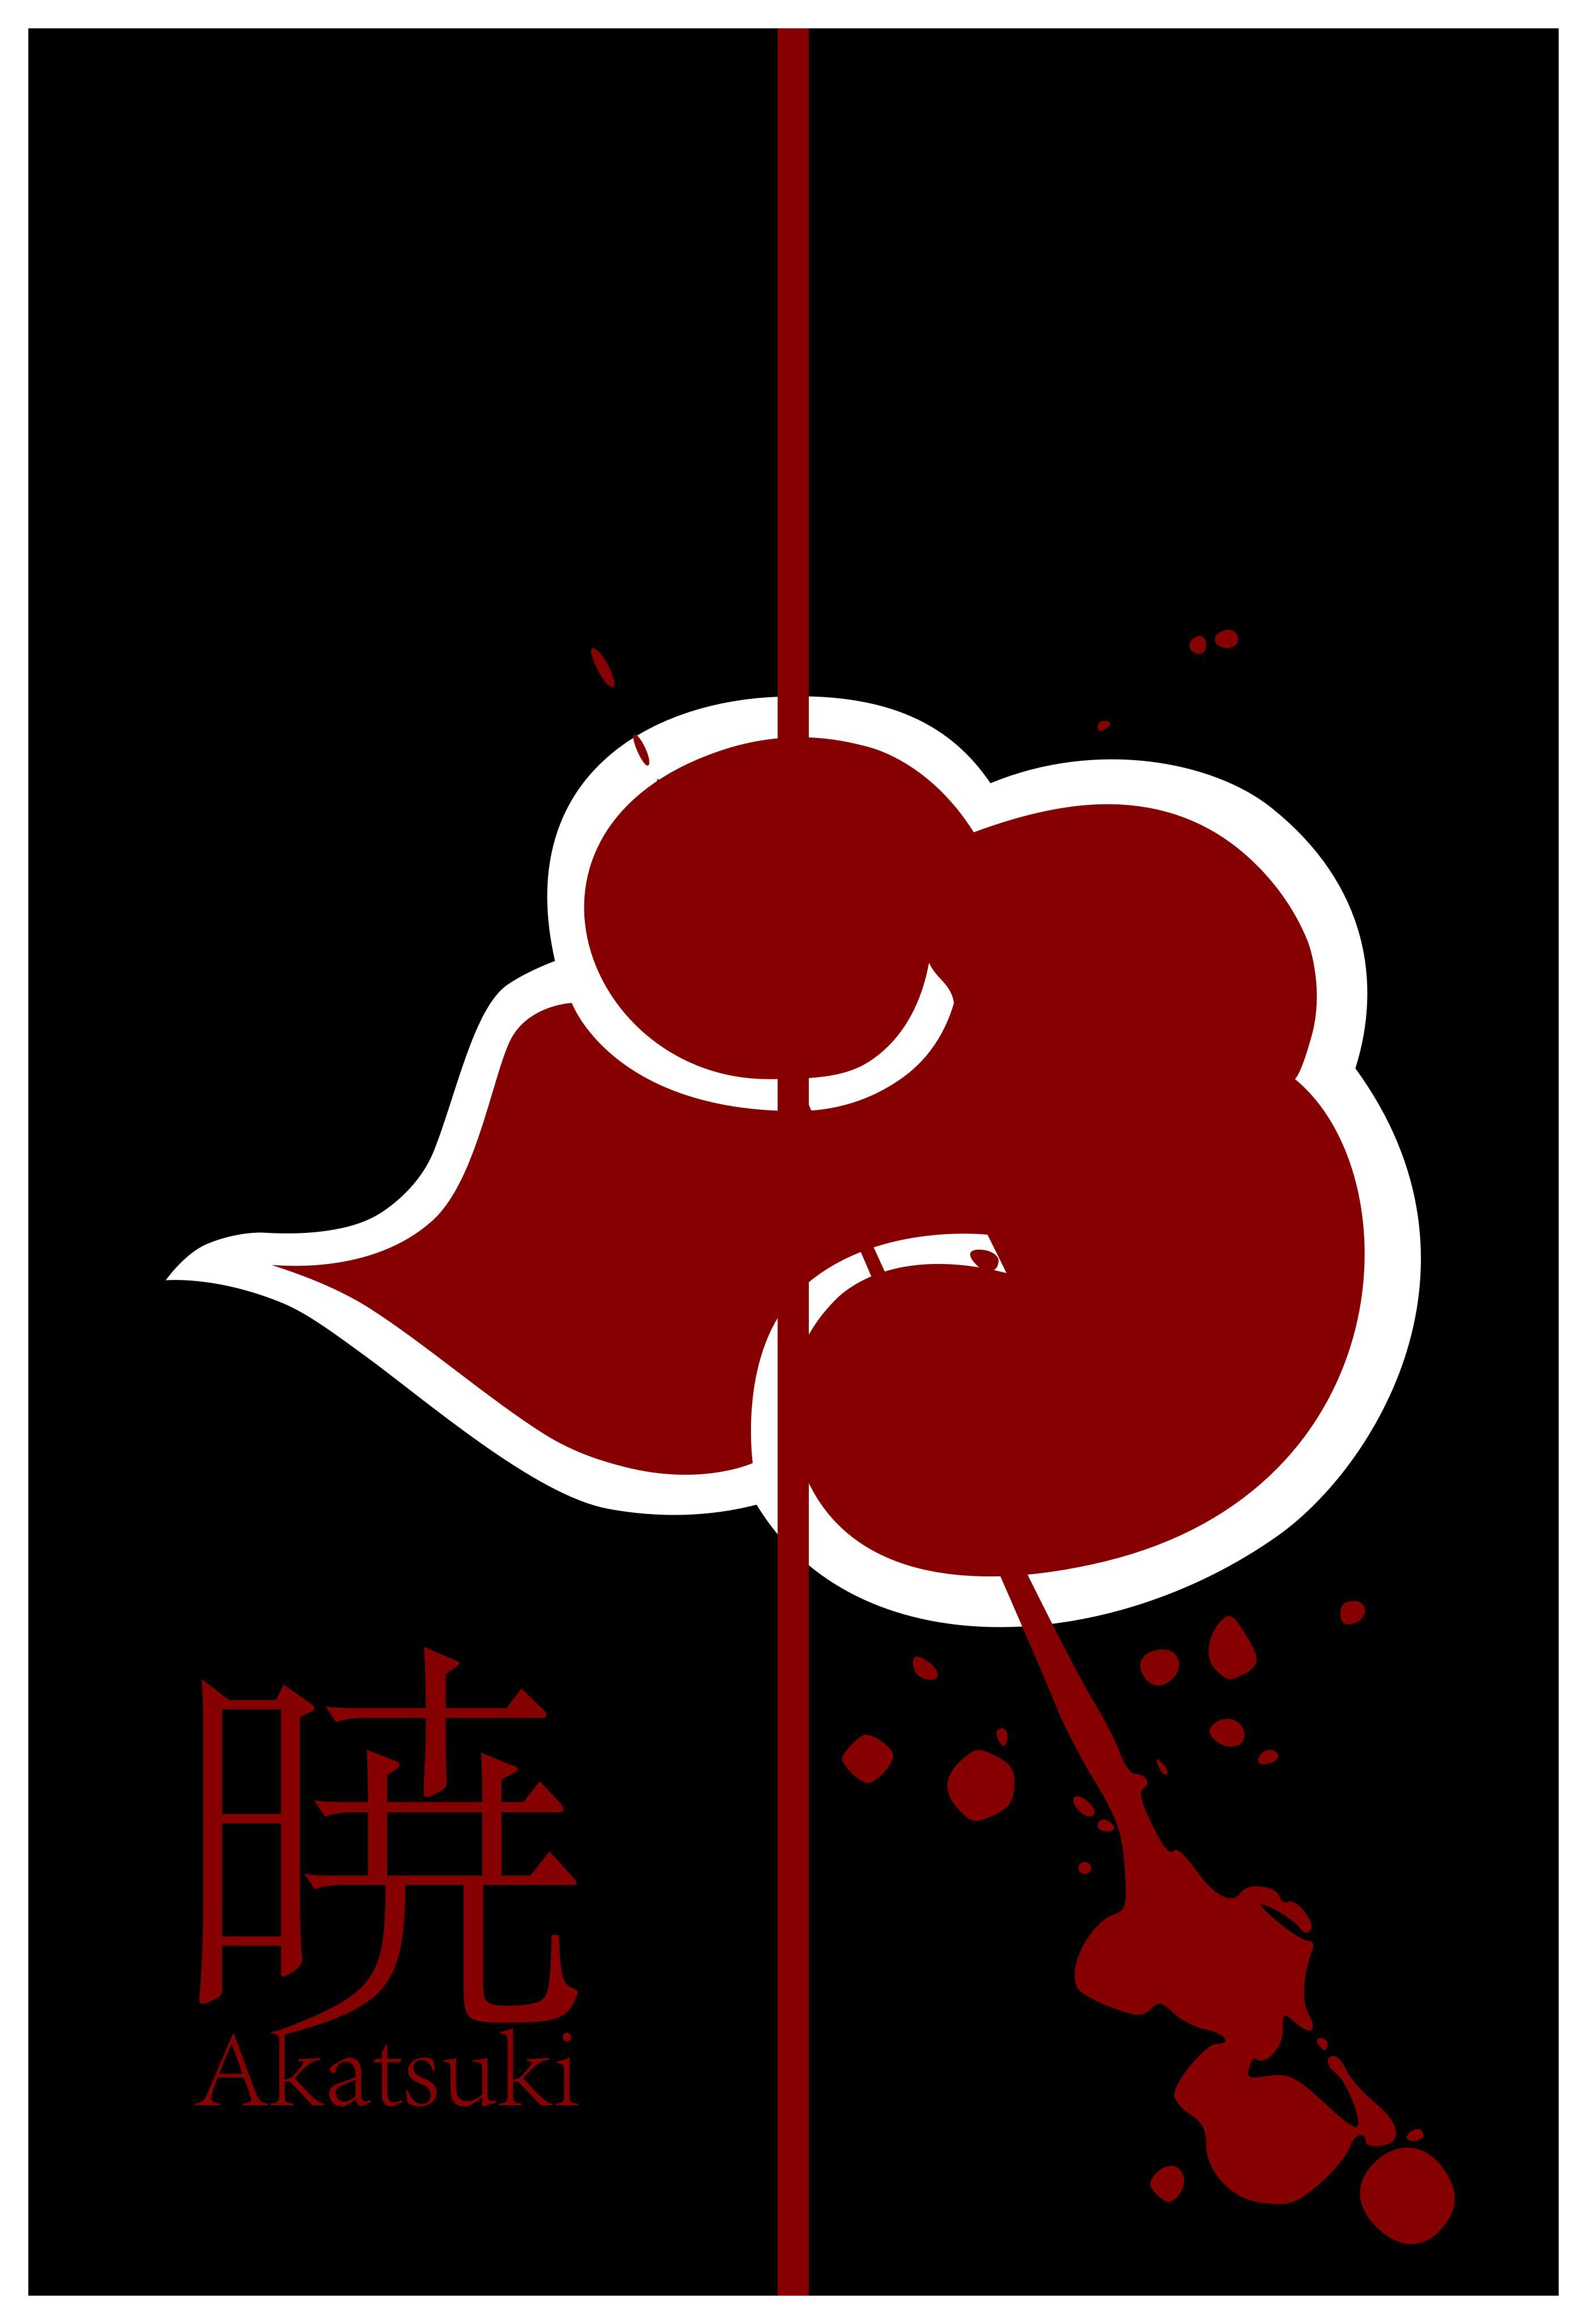 Minimalist akatsuki poster with english by porjin